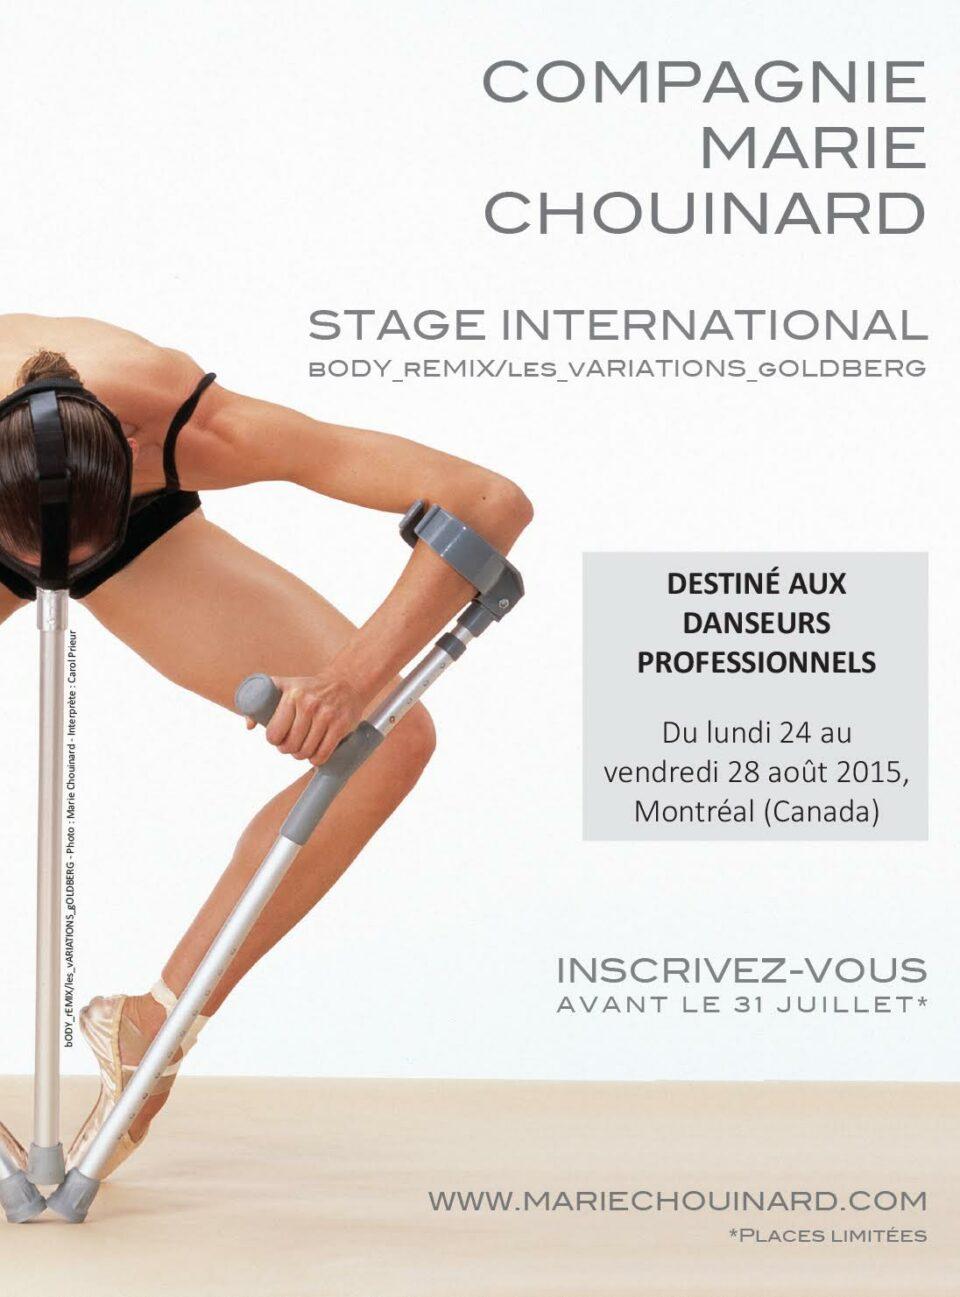 Stage international de la Compagnie Marie Chouinard